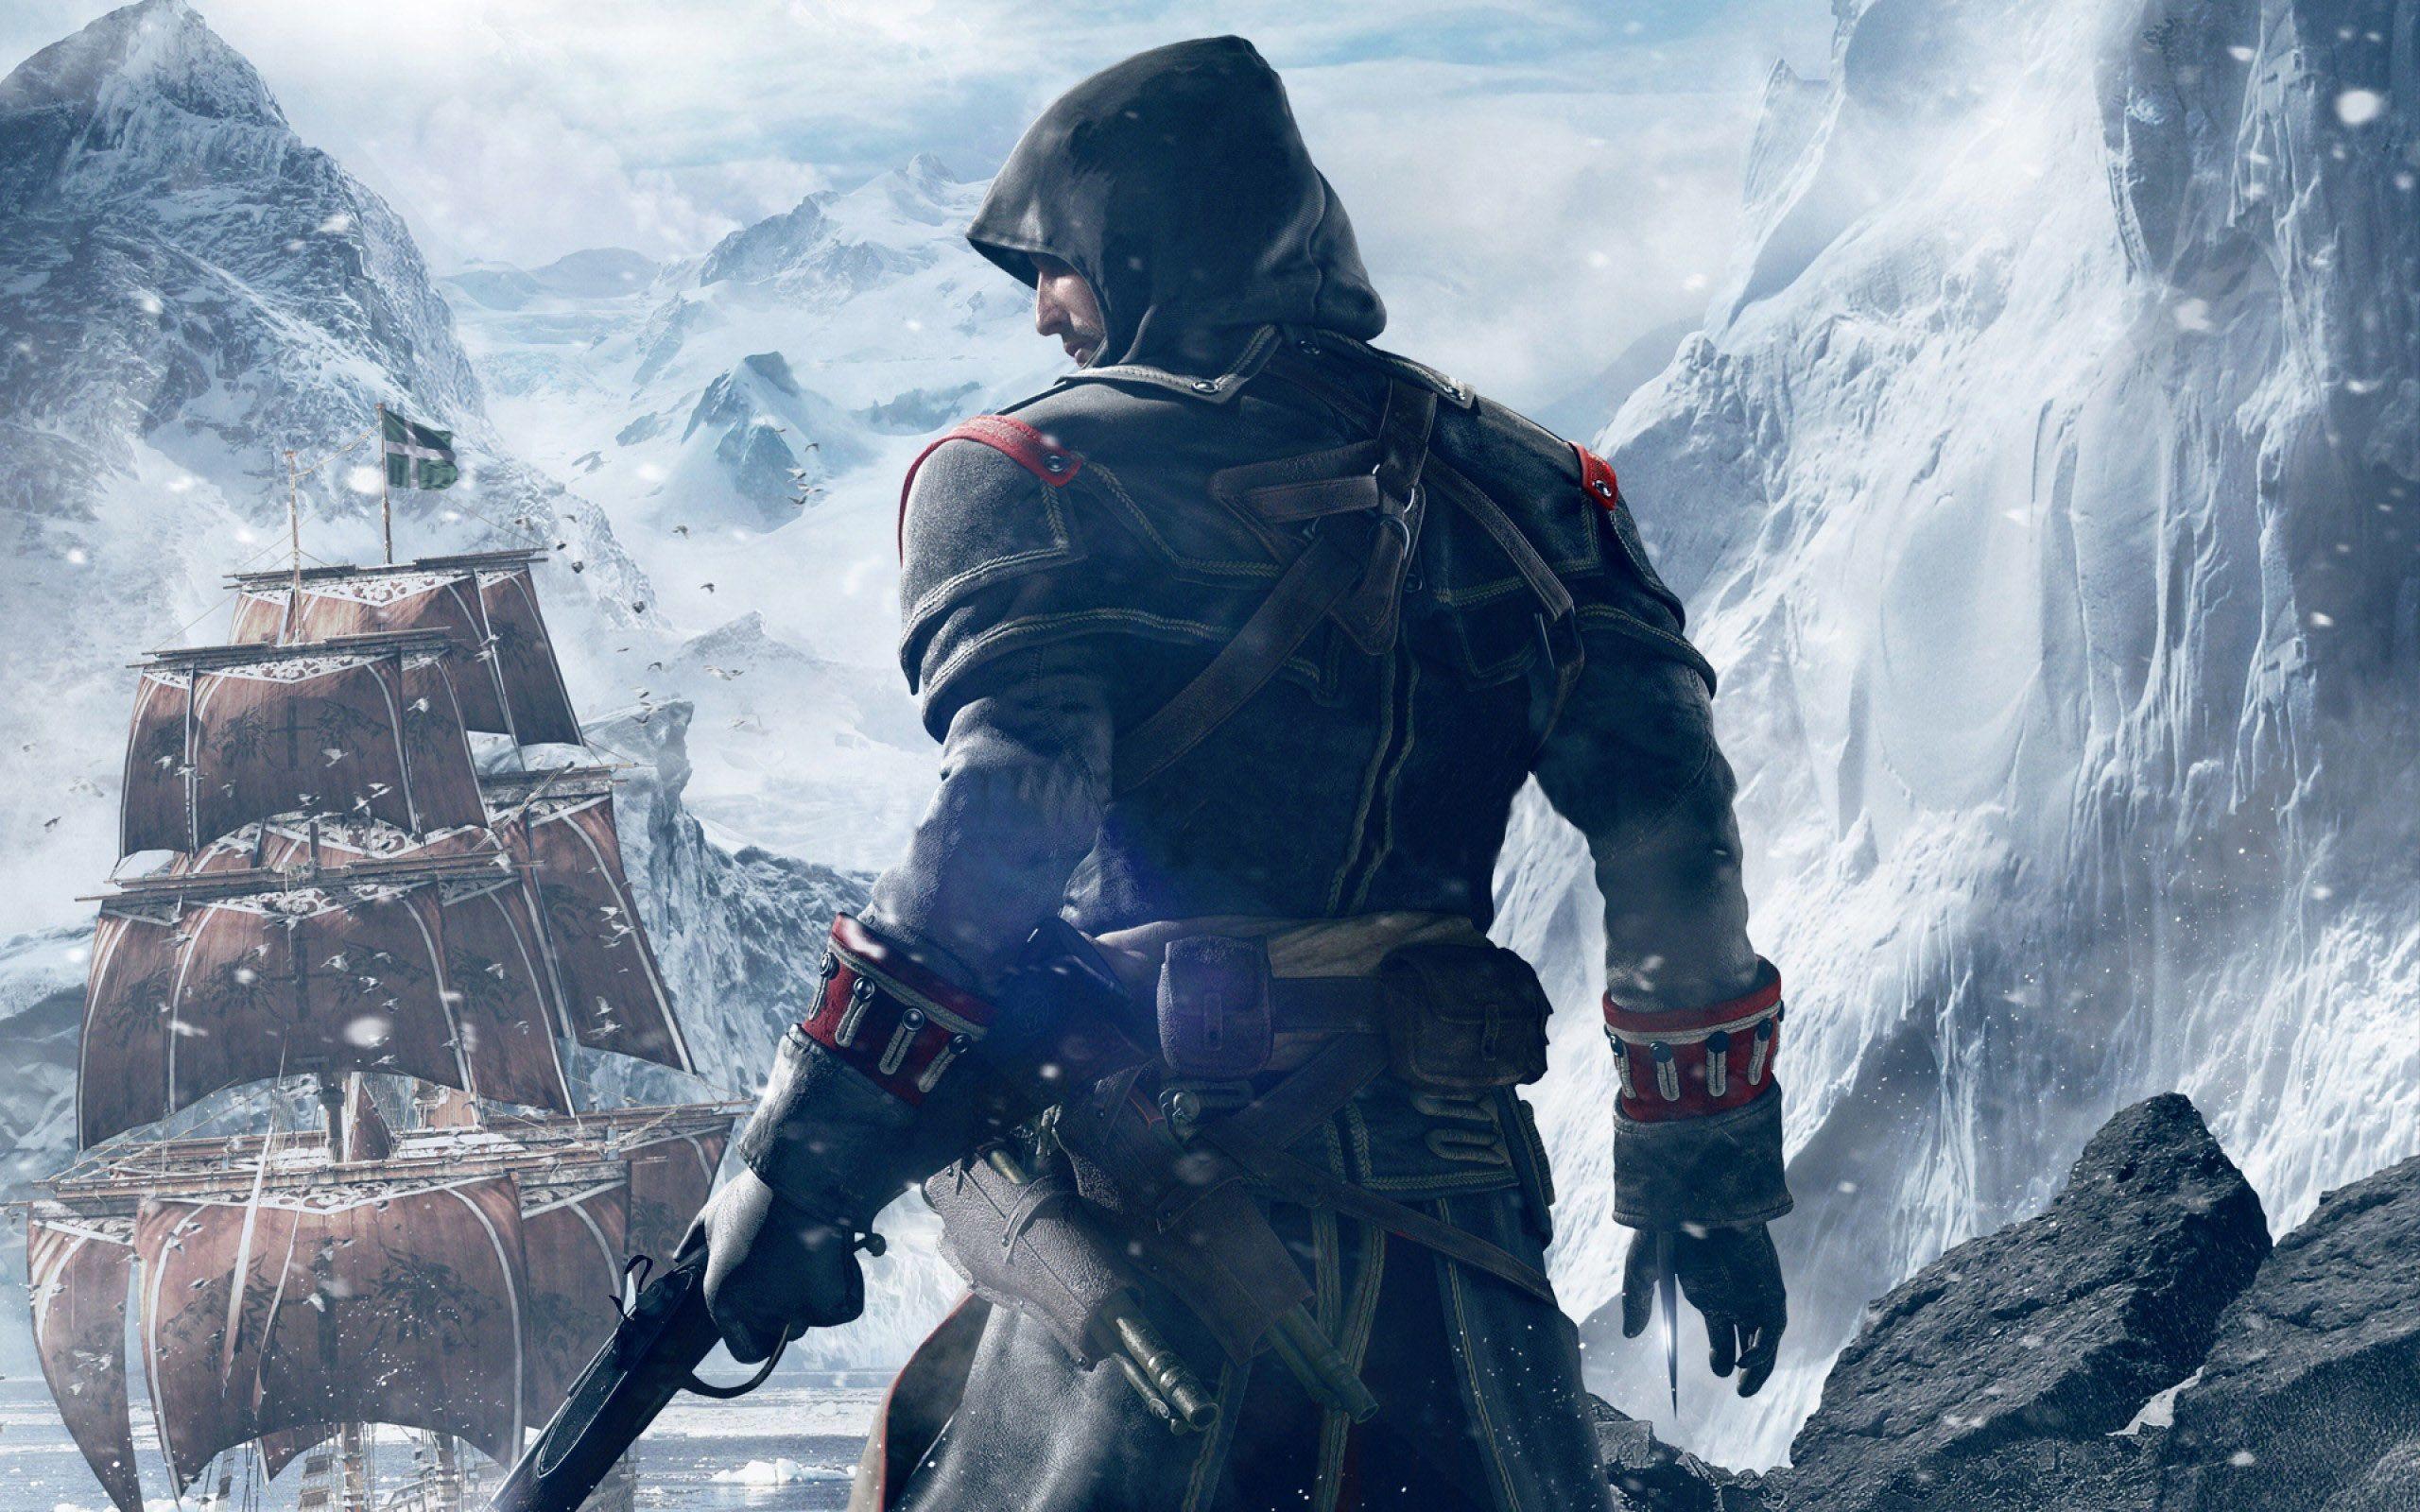 … Assassin's Creed: Brotherhood HD Wallpaper 2560×1600